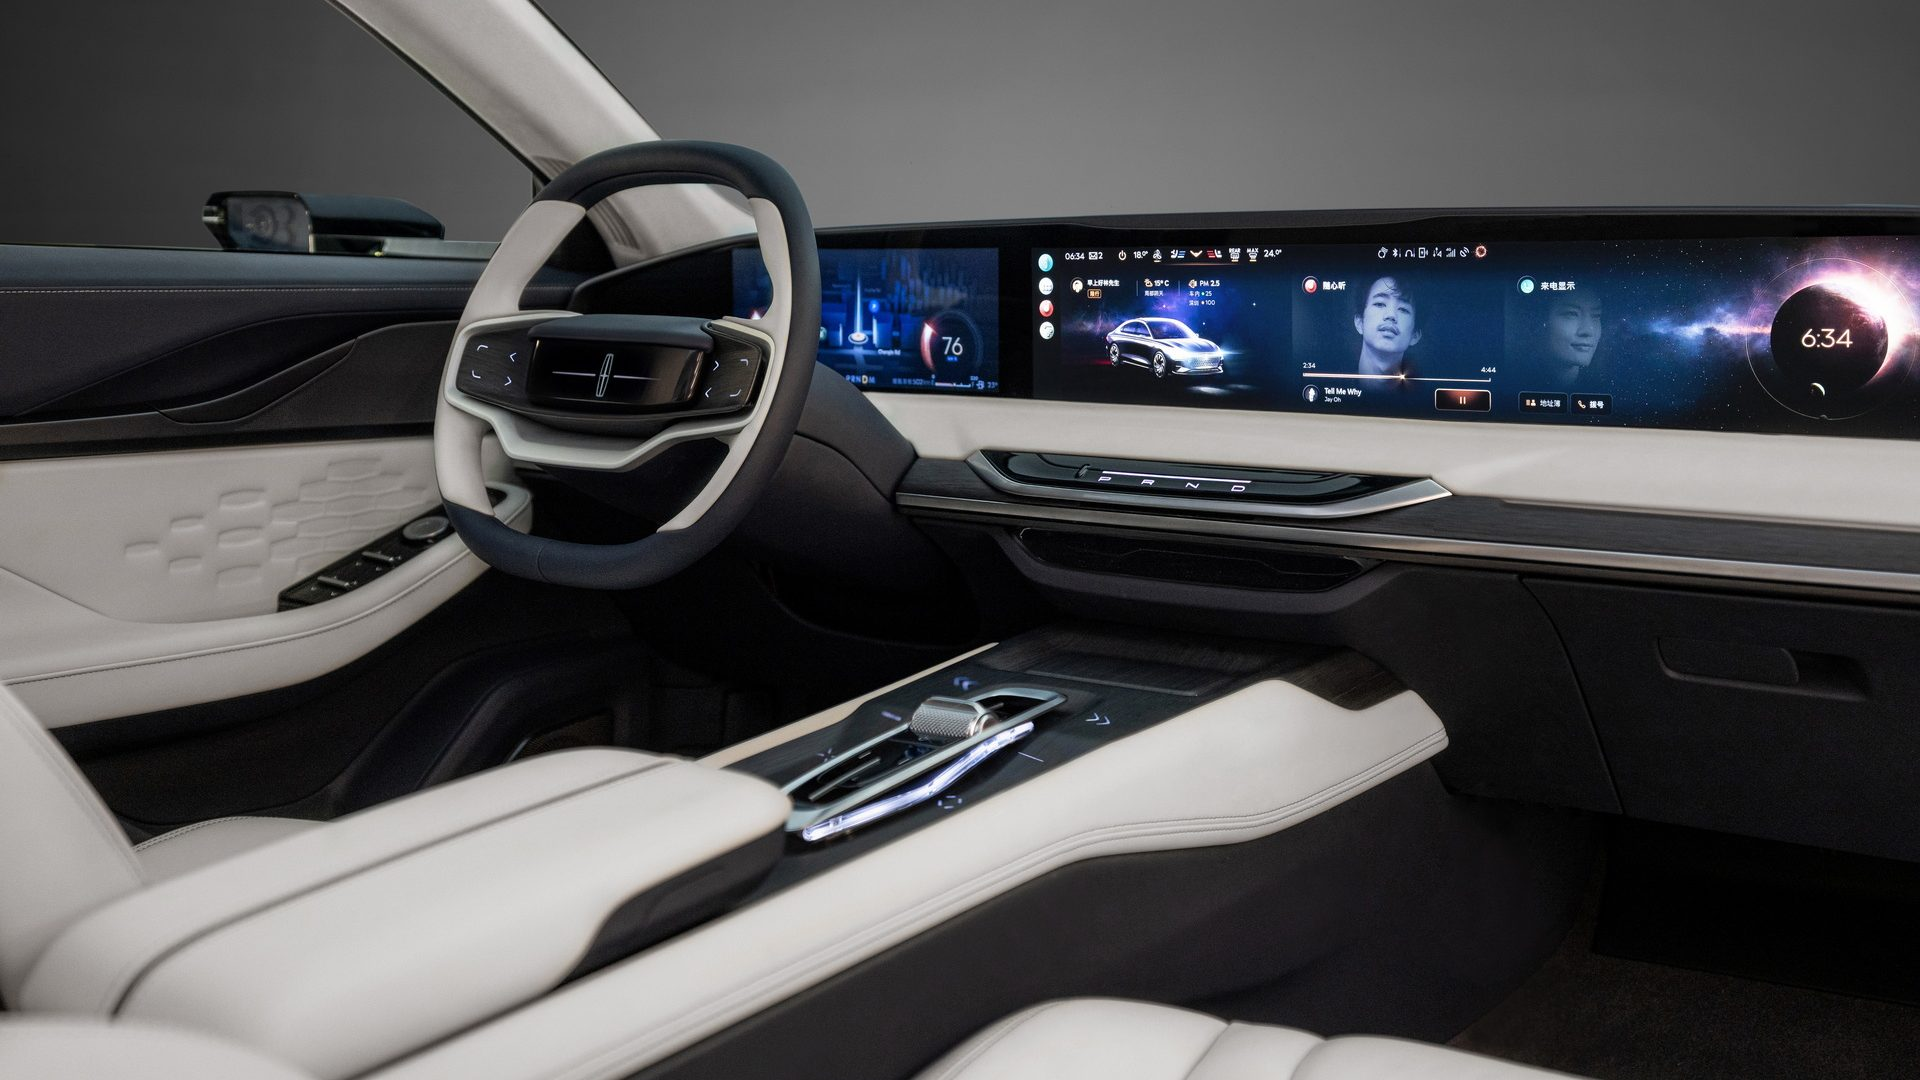 2021-Lincoln-Zephyr-Reflection-Preview-Car-Interior-01